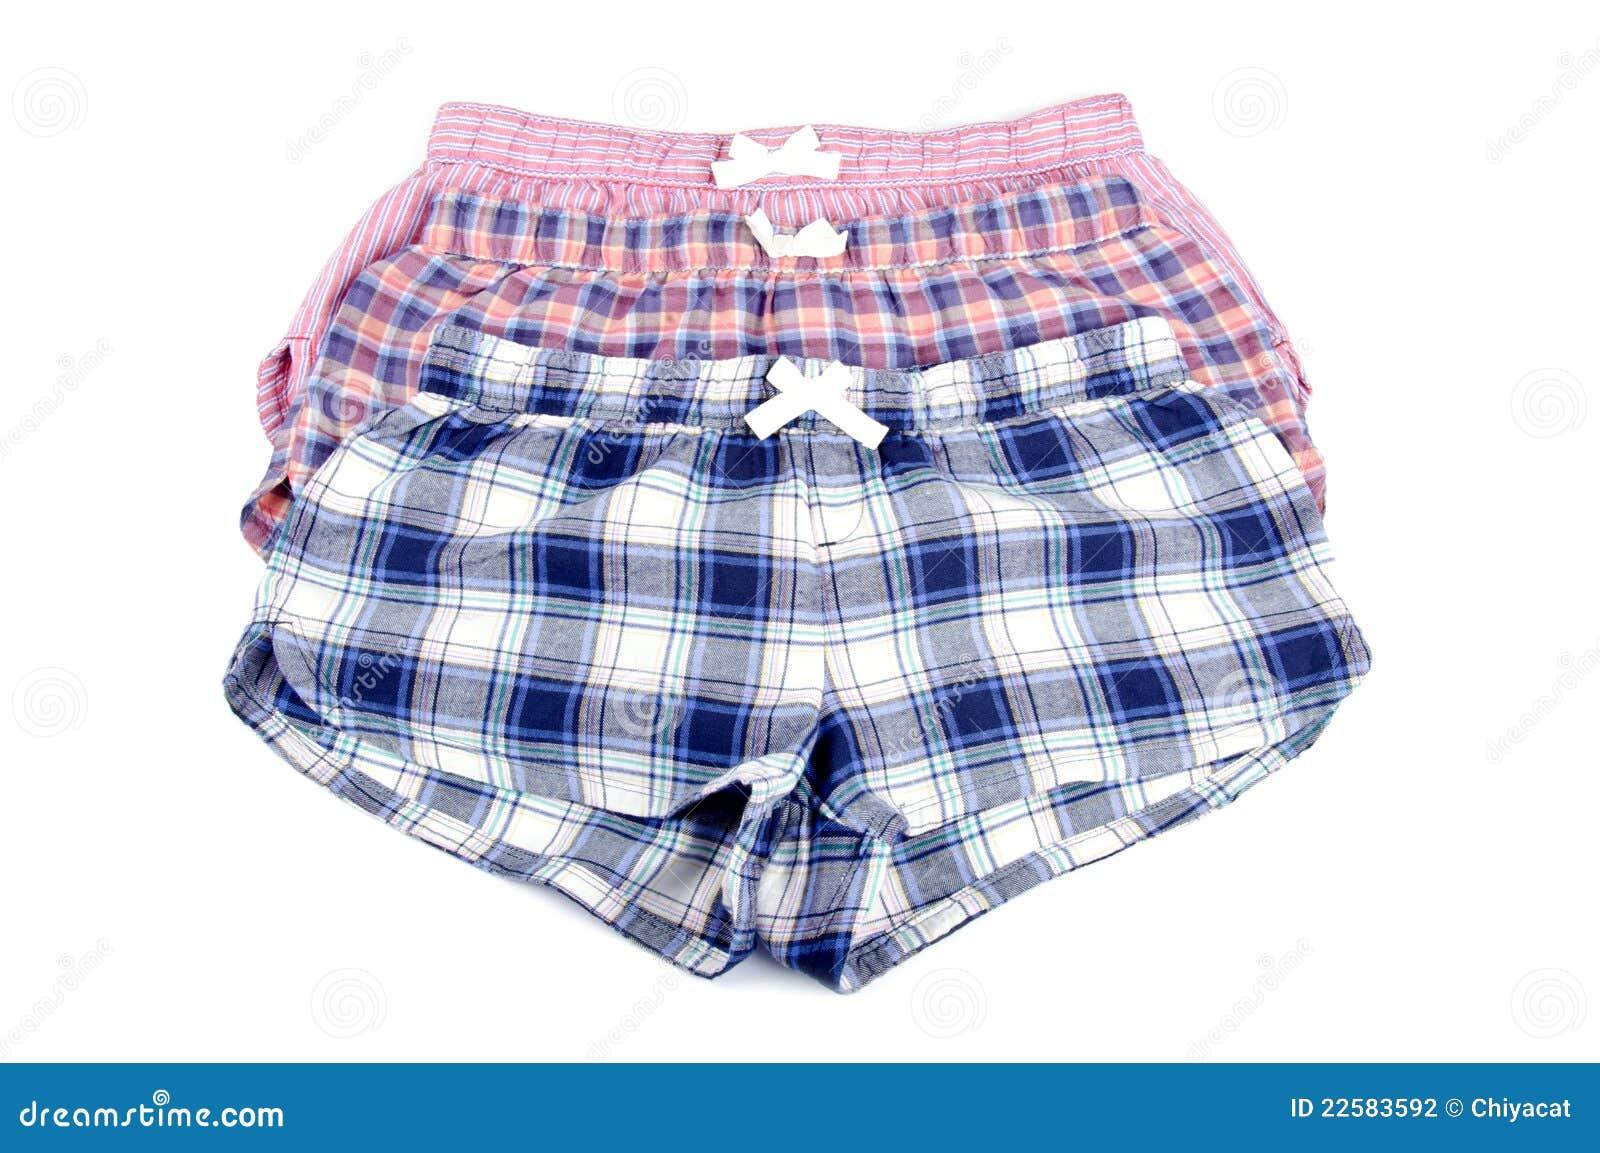 Flannel Pajamas Shorts Isolated On White Stock Photography - Image ...